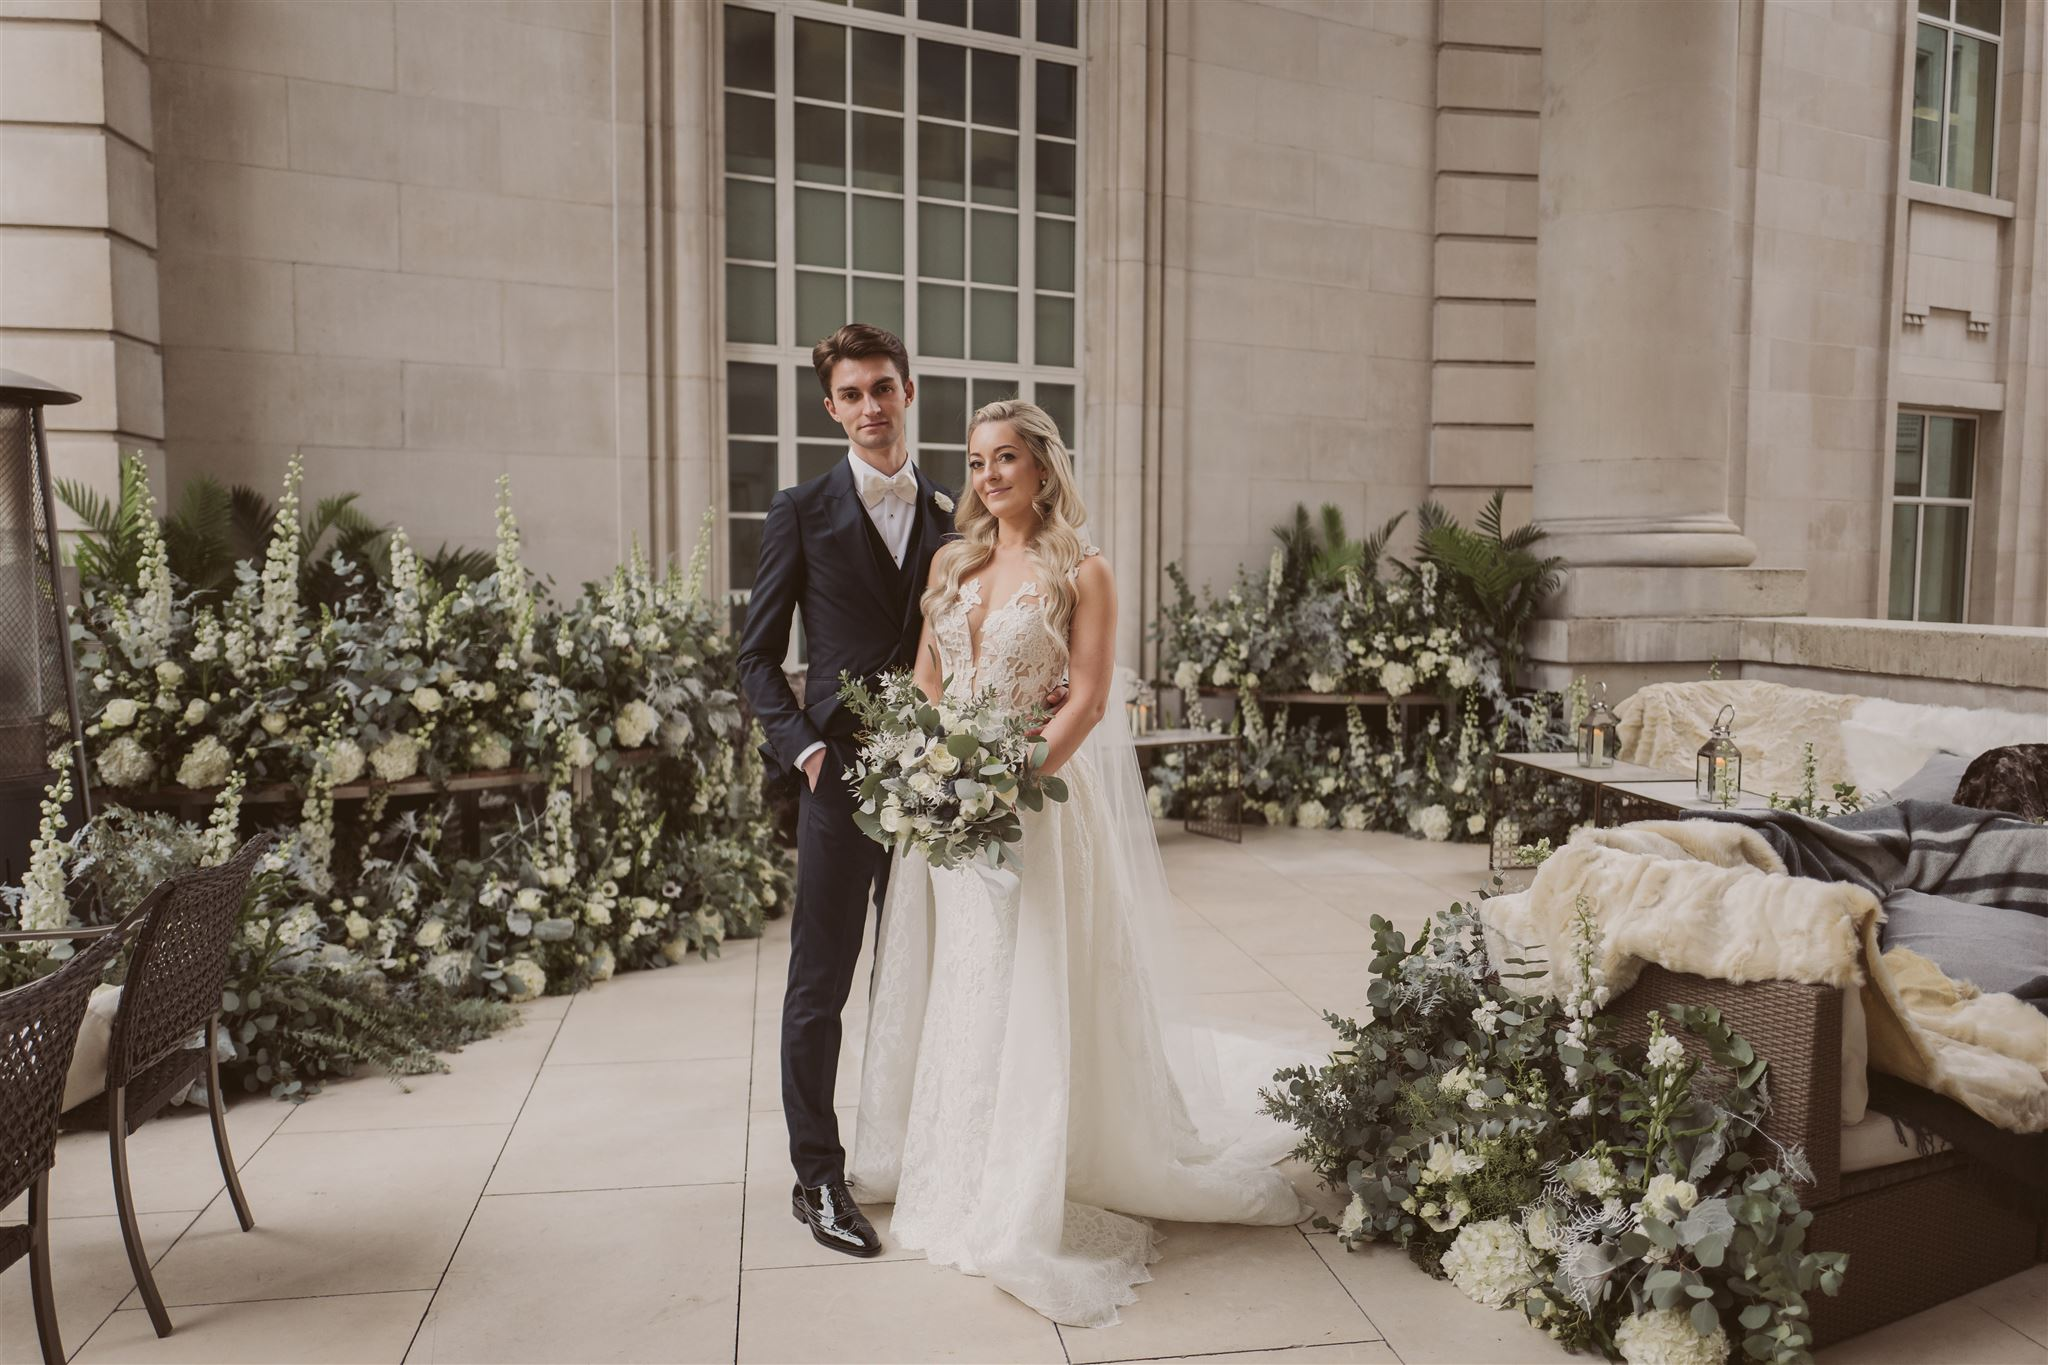 Wedding Flowers at Cafe Royal, London by Rachel Morgan